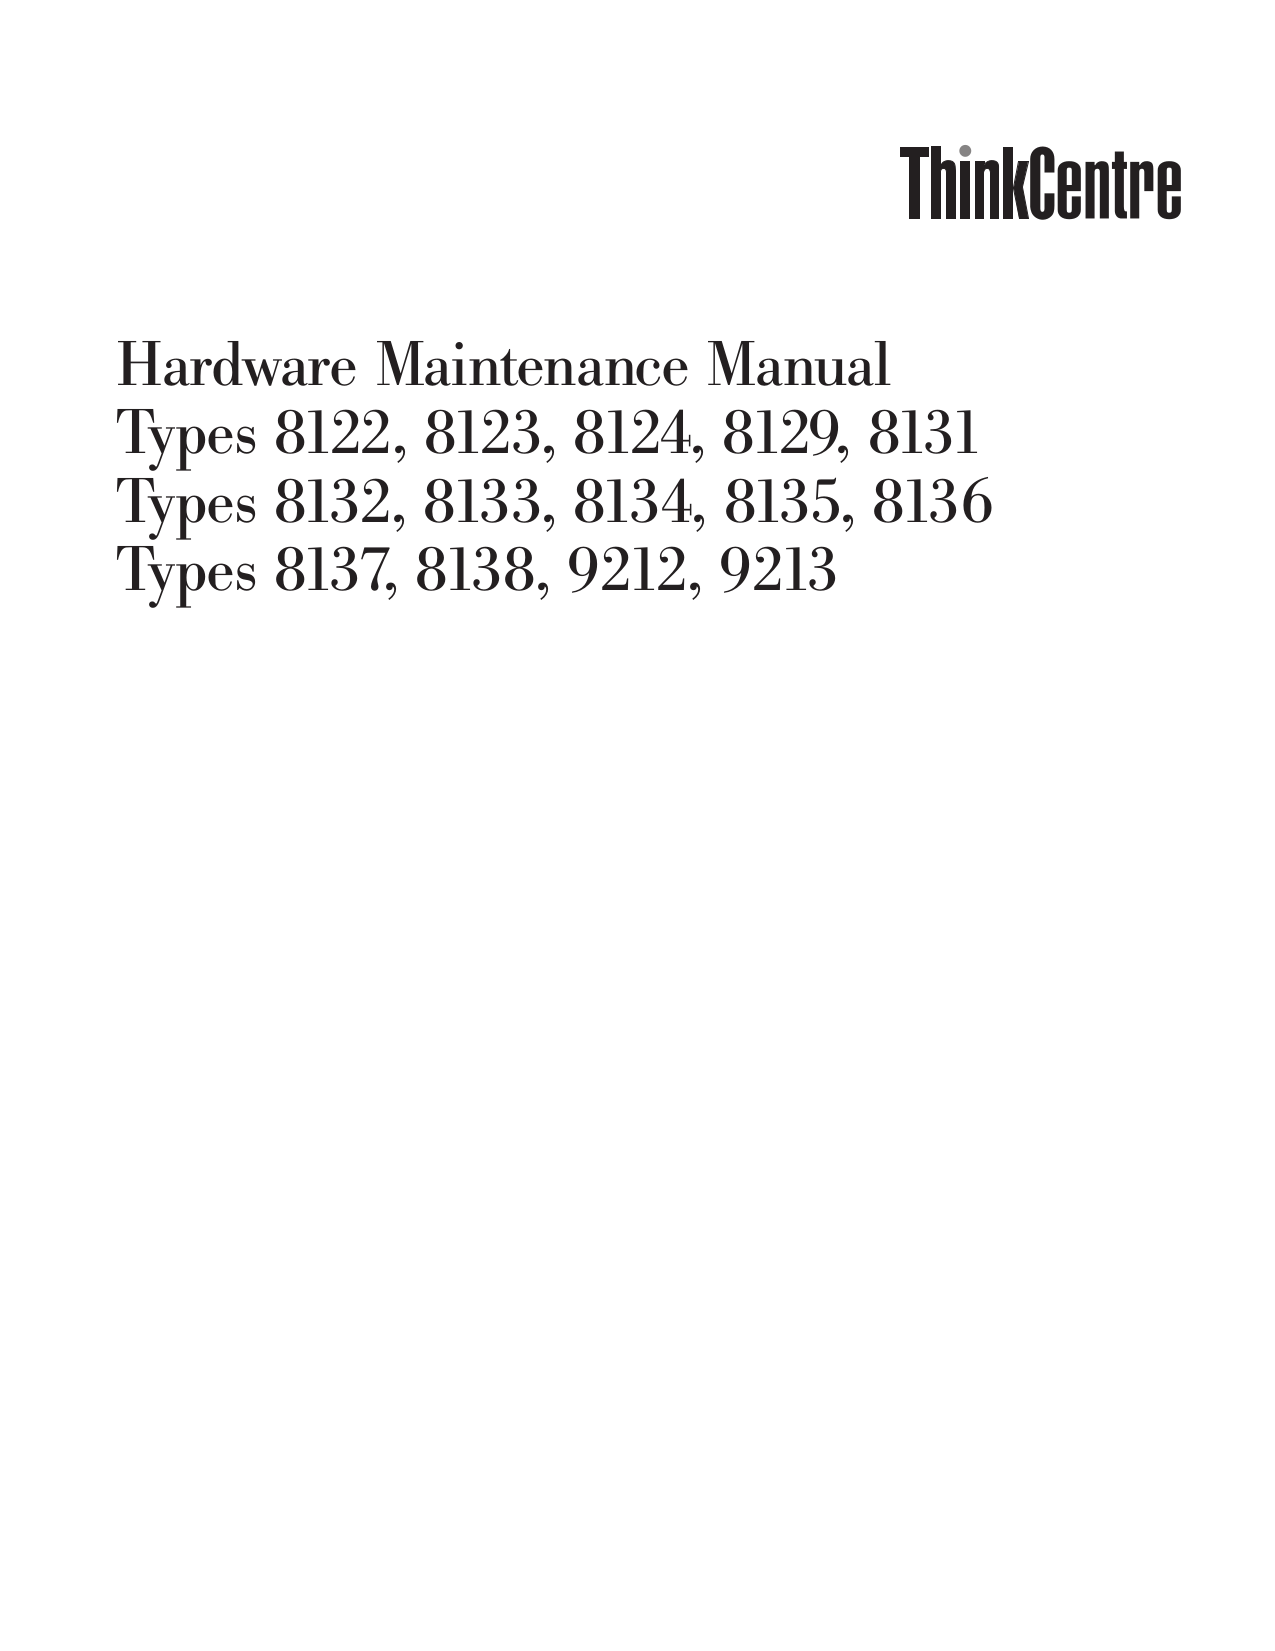 pdf for Lenovo Desktop ThinkCentre M50 8189 manual